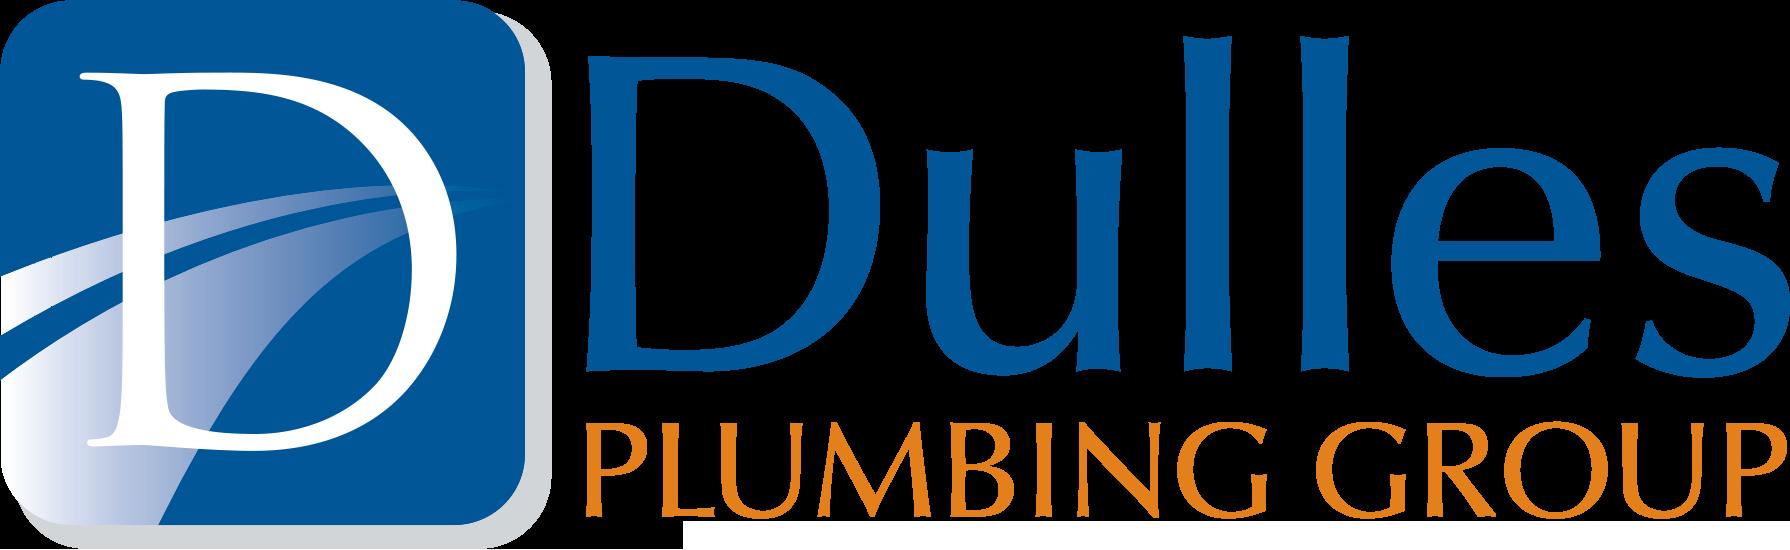 Dulles Plumbing Group Logo